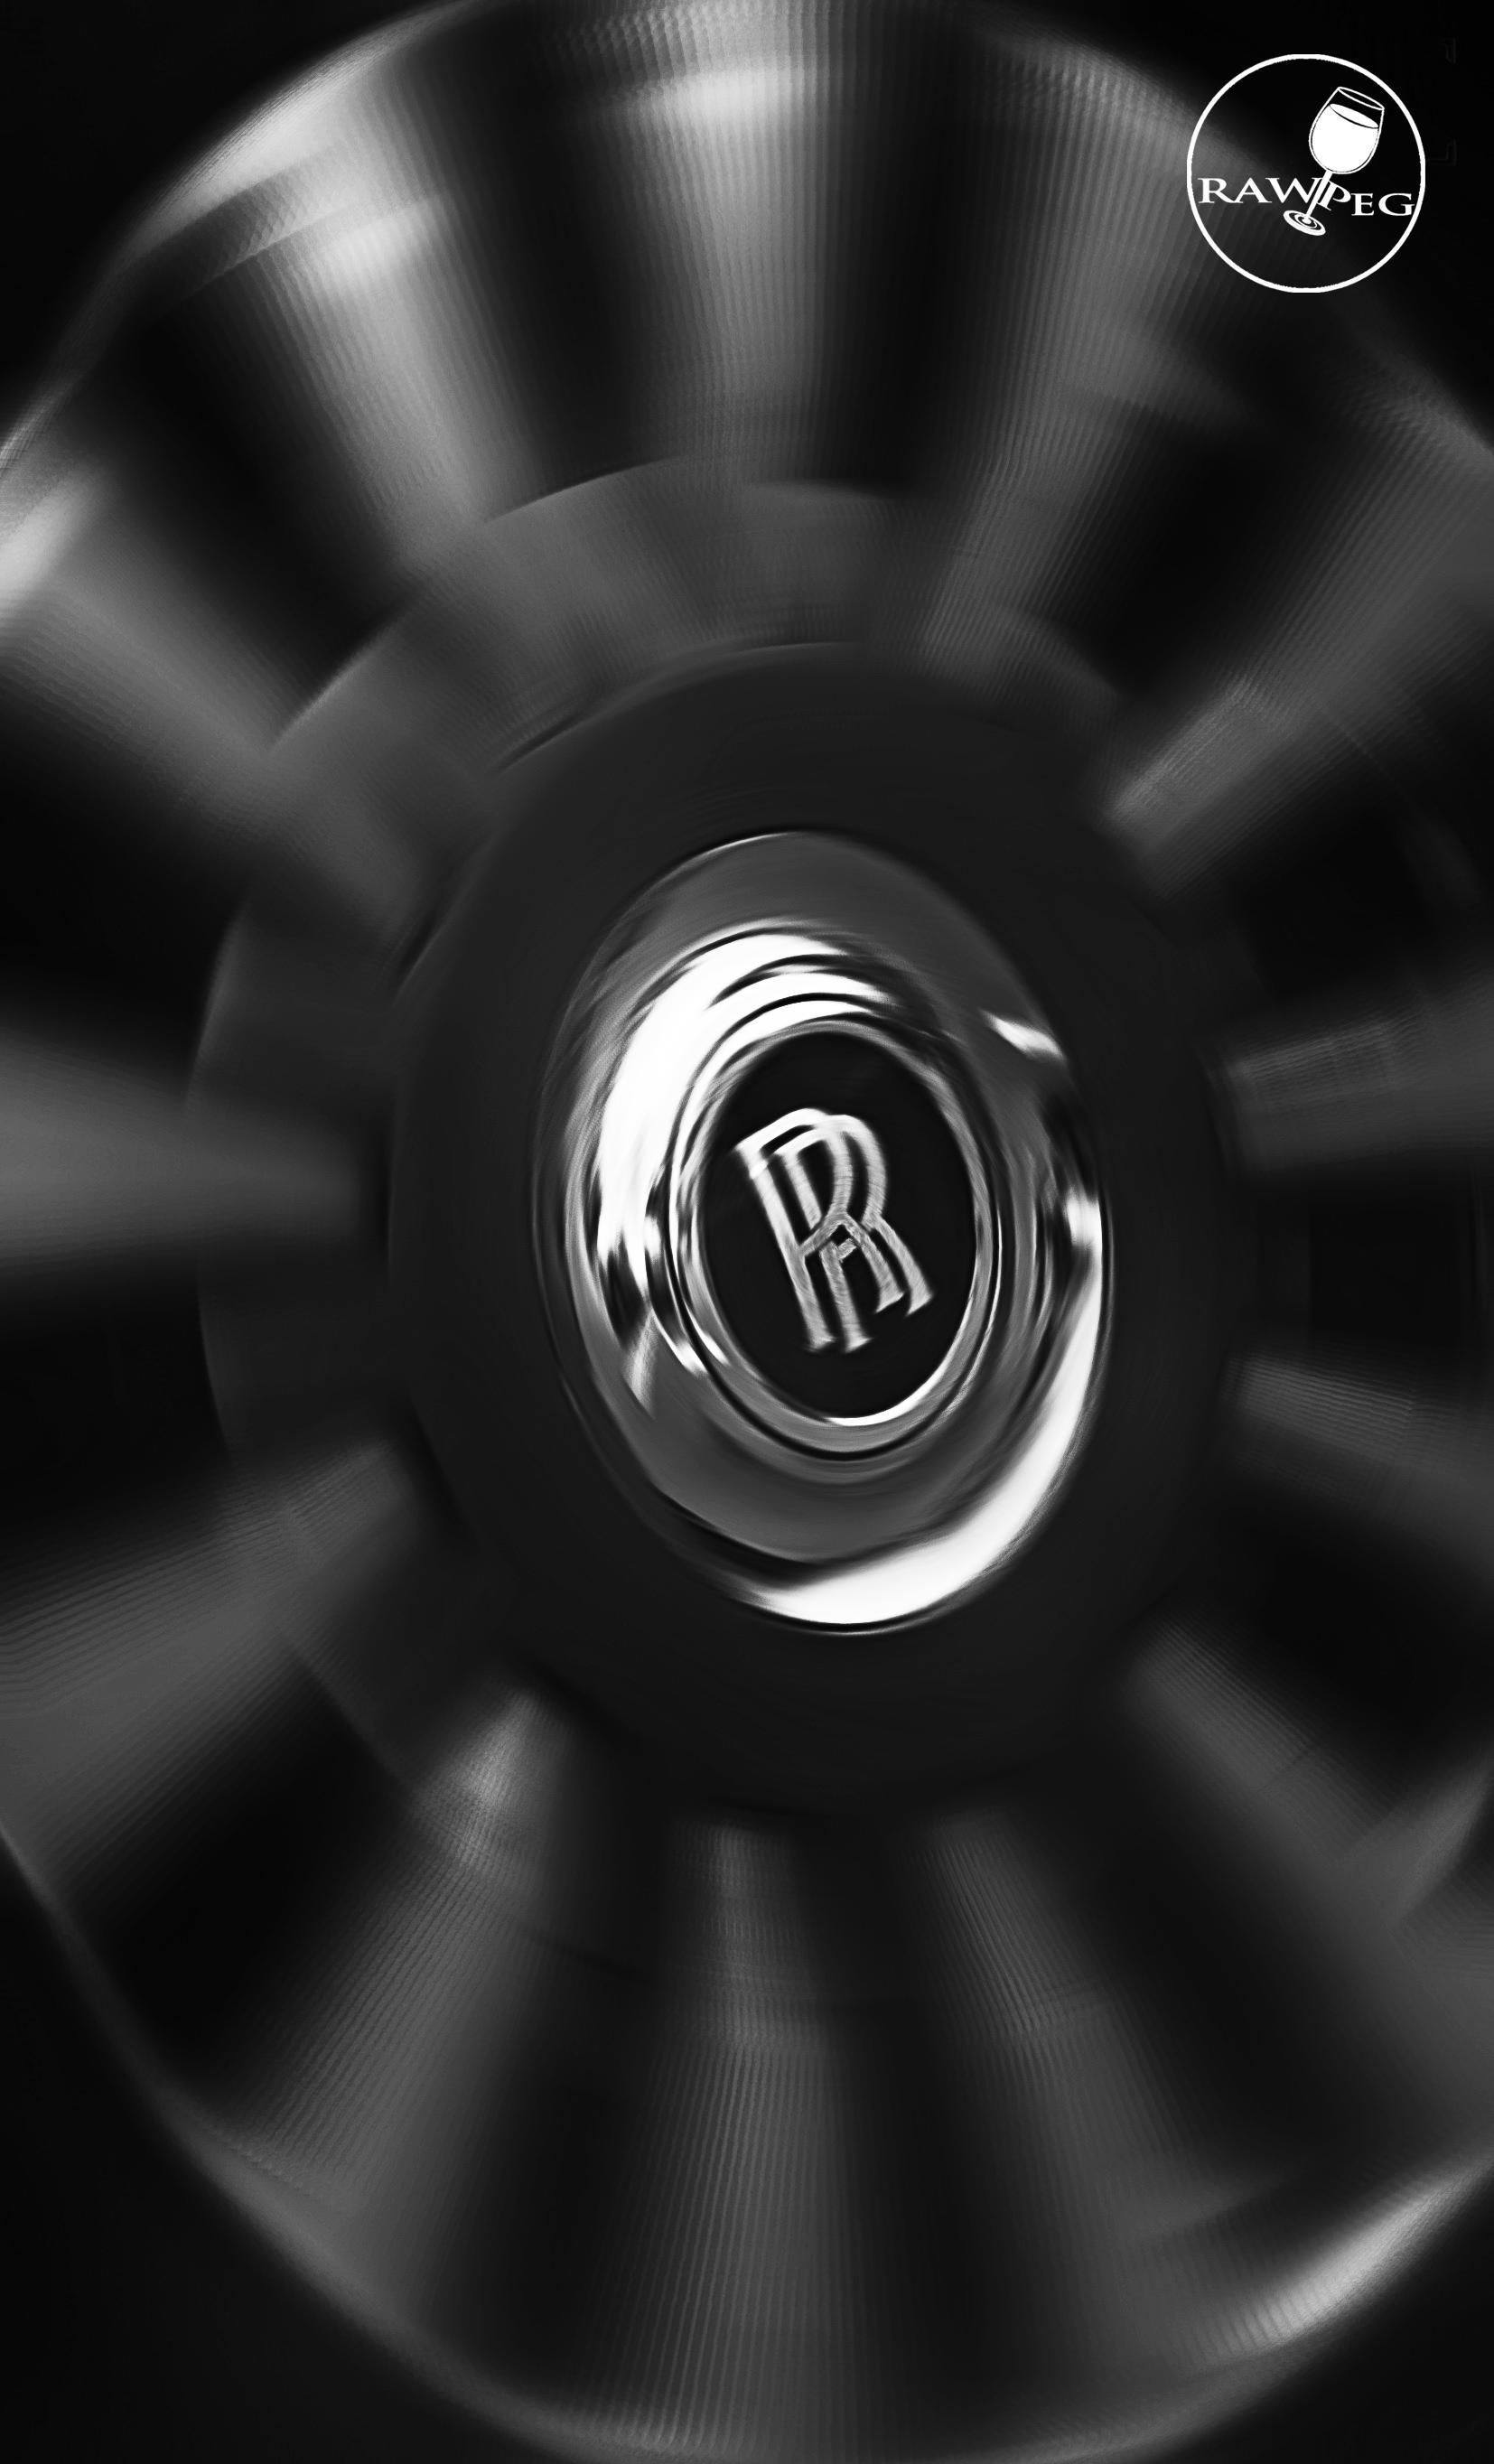 #rawpegstudio#rollsroyce#motionblur